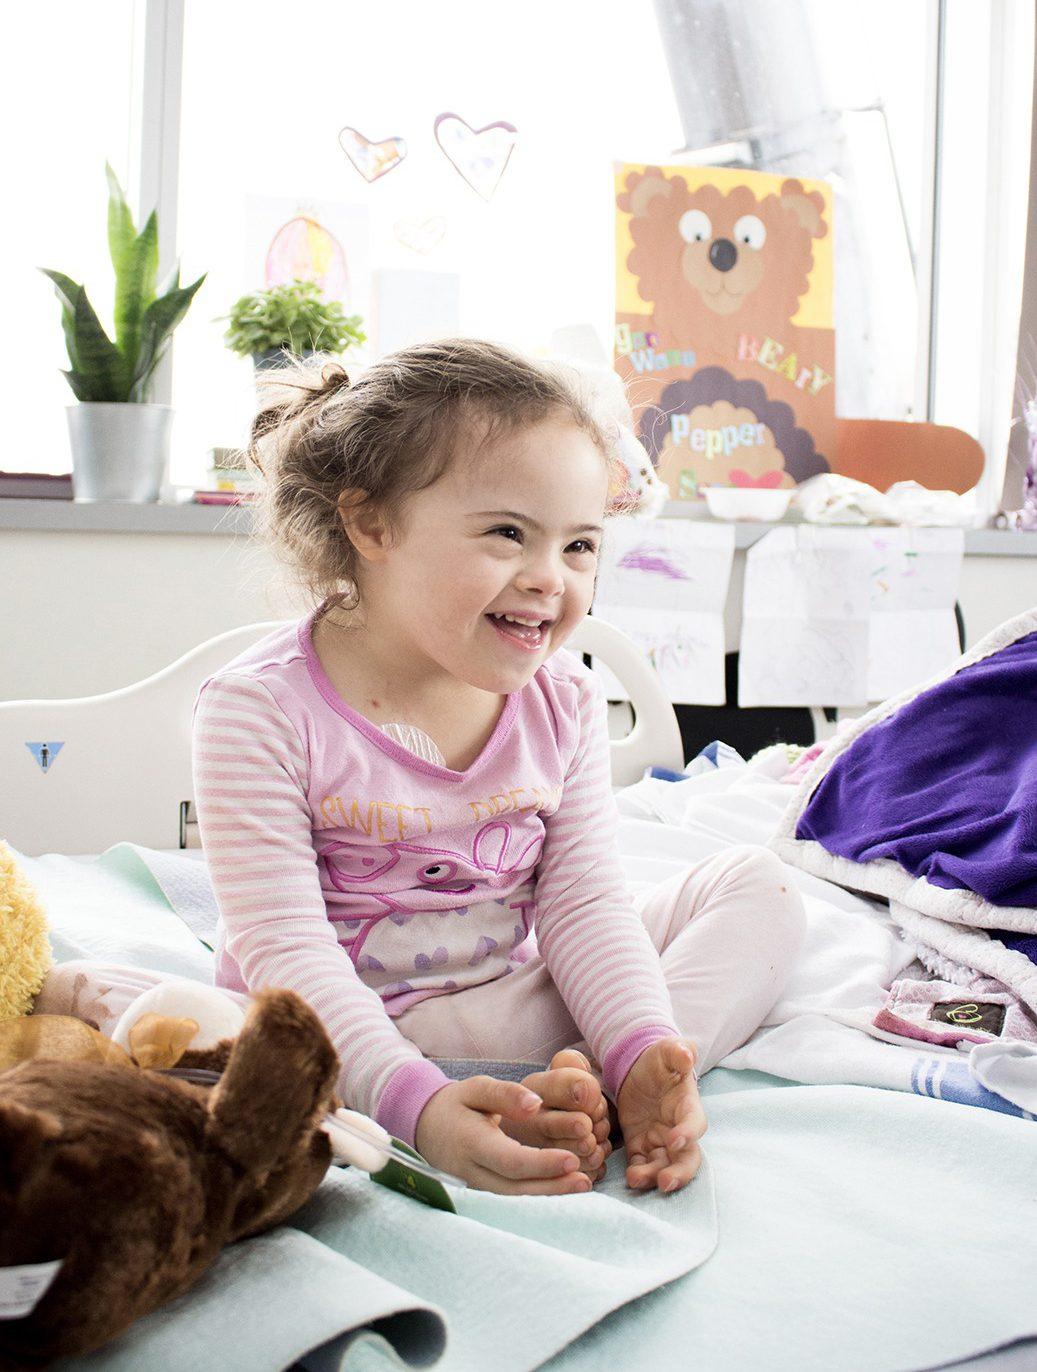 little girl in London hospital bed